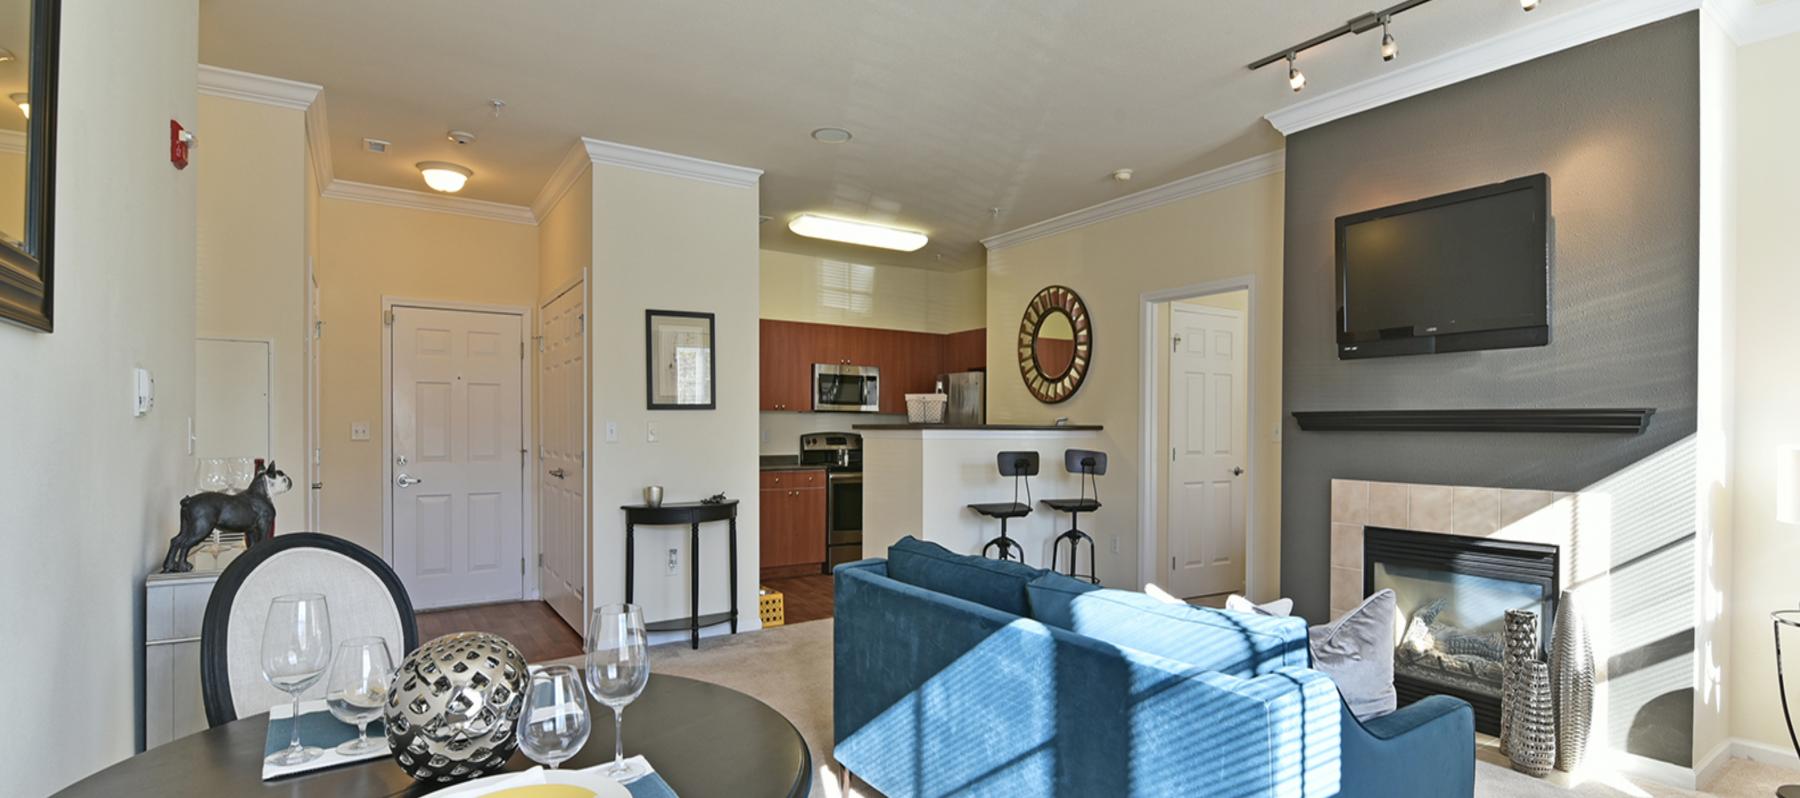 11 - Apartment Dining & Living copy 2